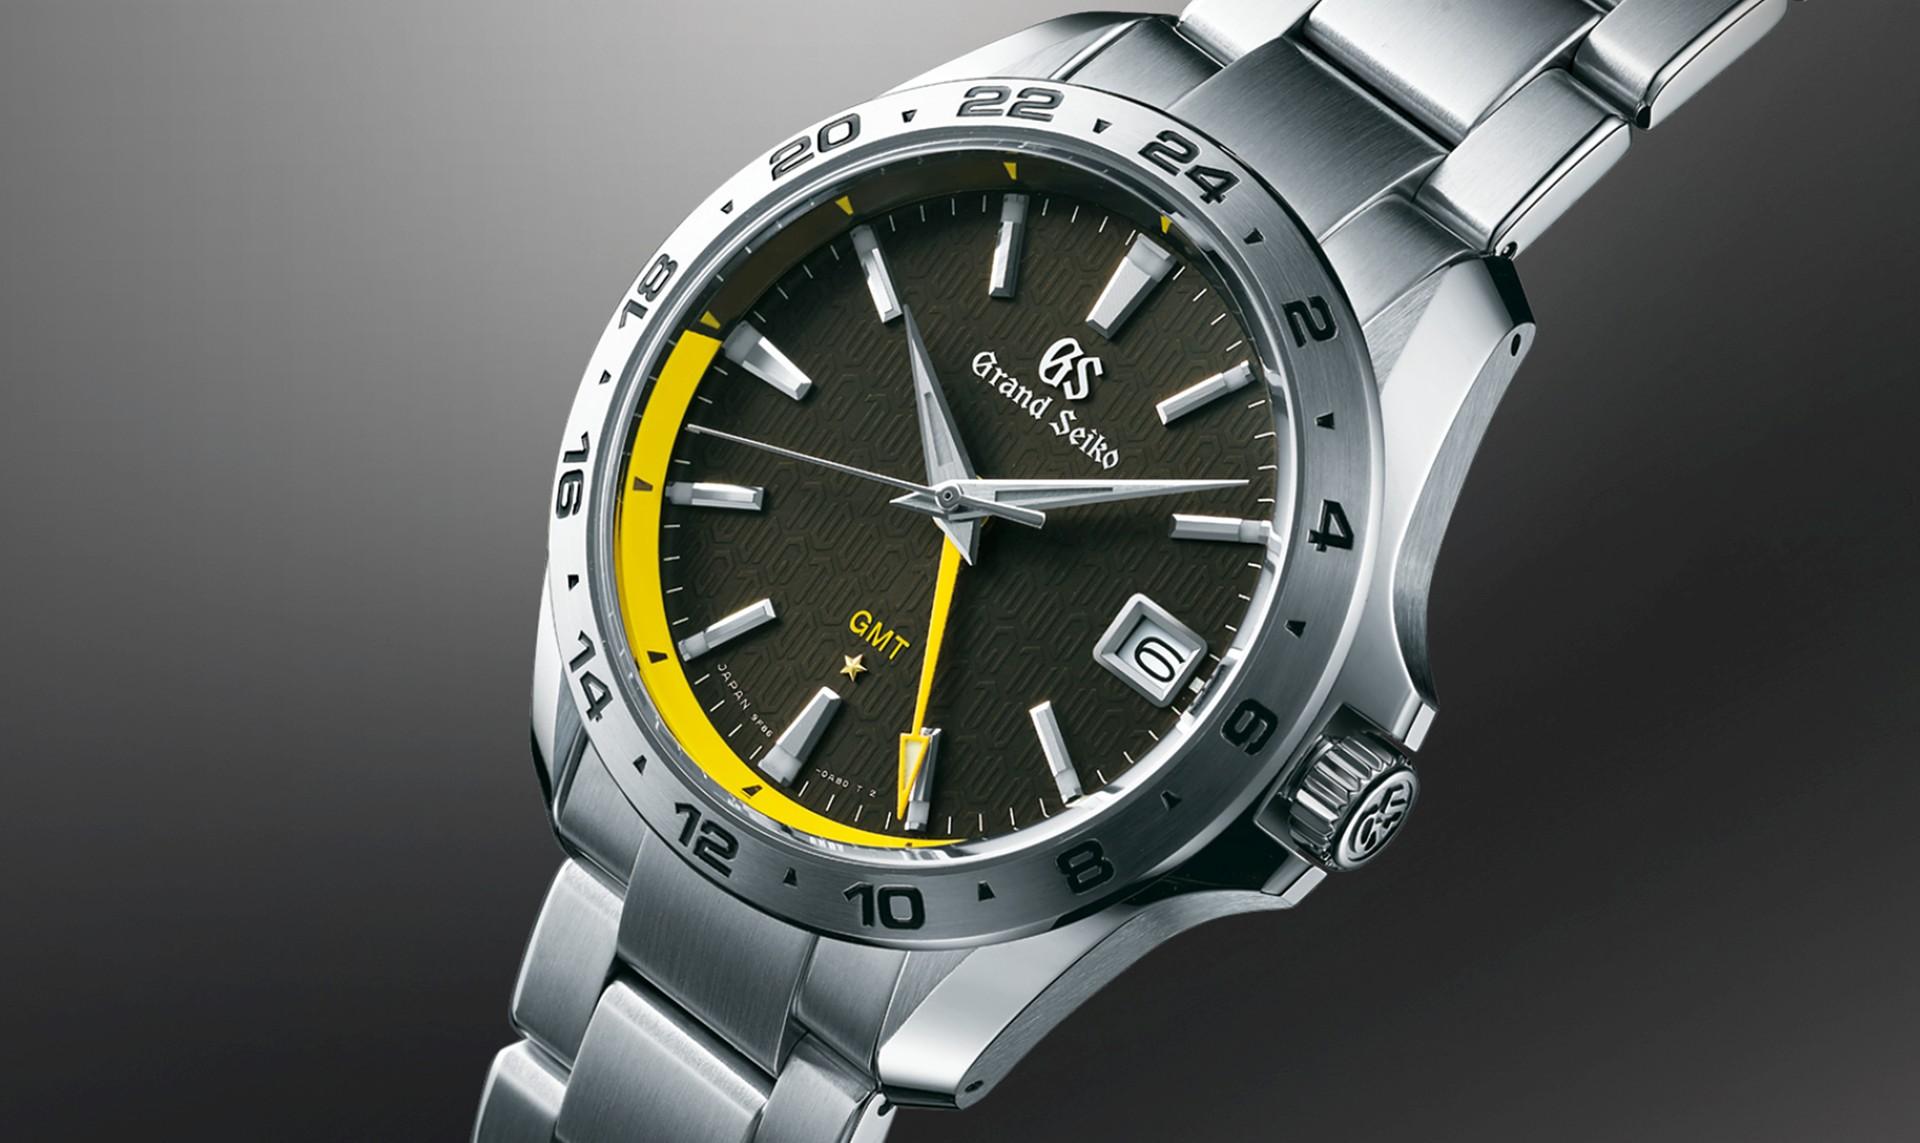 GRAND SEIKO發表旗下第一款9F石英機芯GMT兩地時間腕錶系列